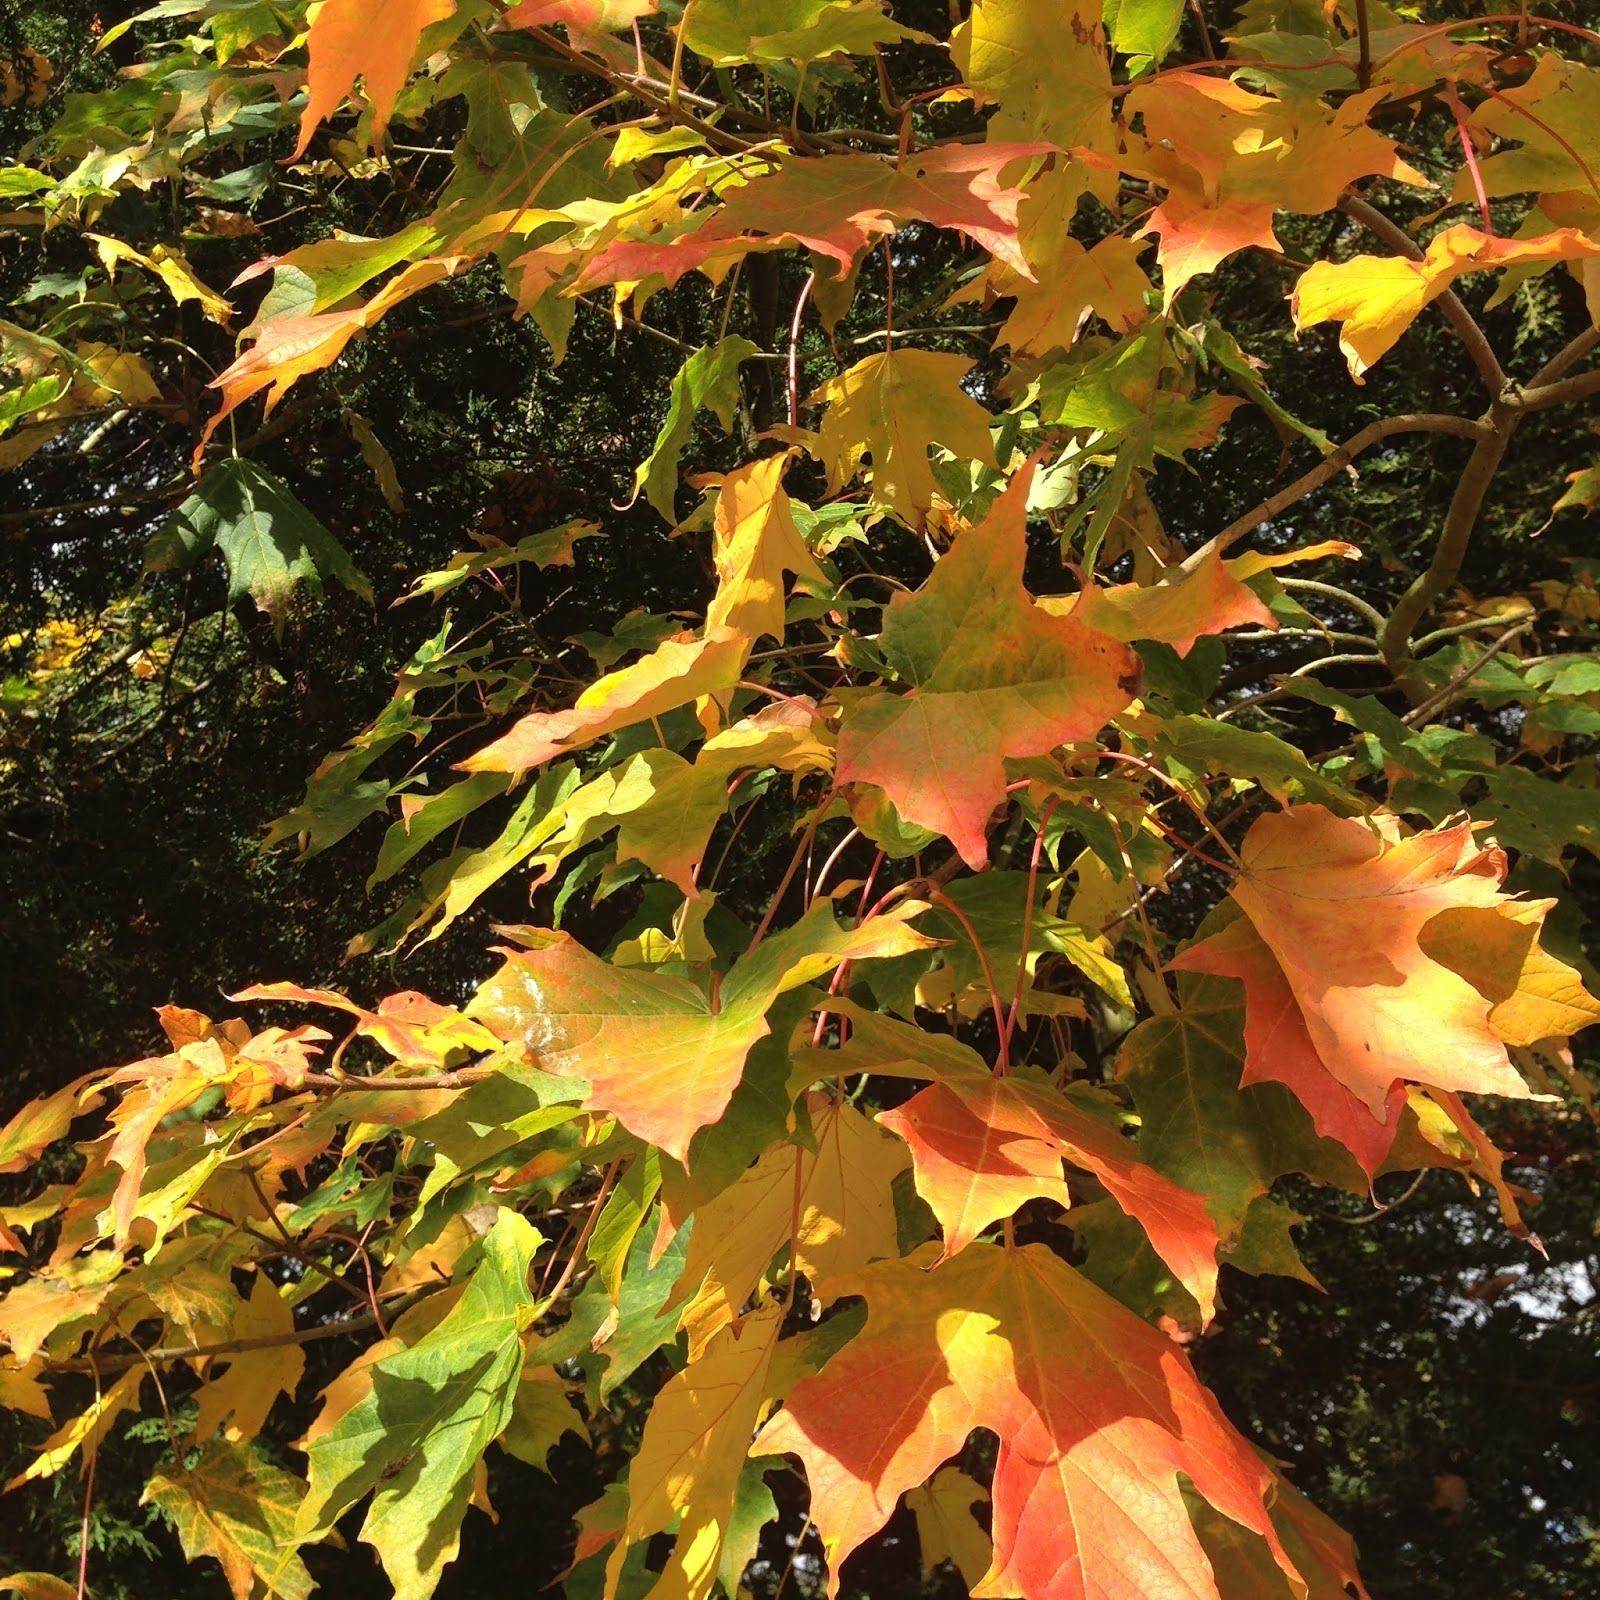 http://rememberingtheoldways.blogspot.co.uk/2015/10/early-autumn-days_5.html?utm_source=feedburner